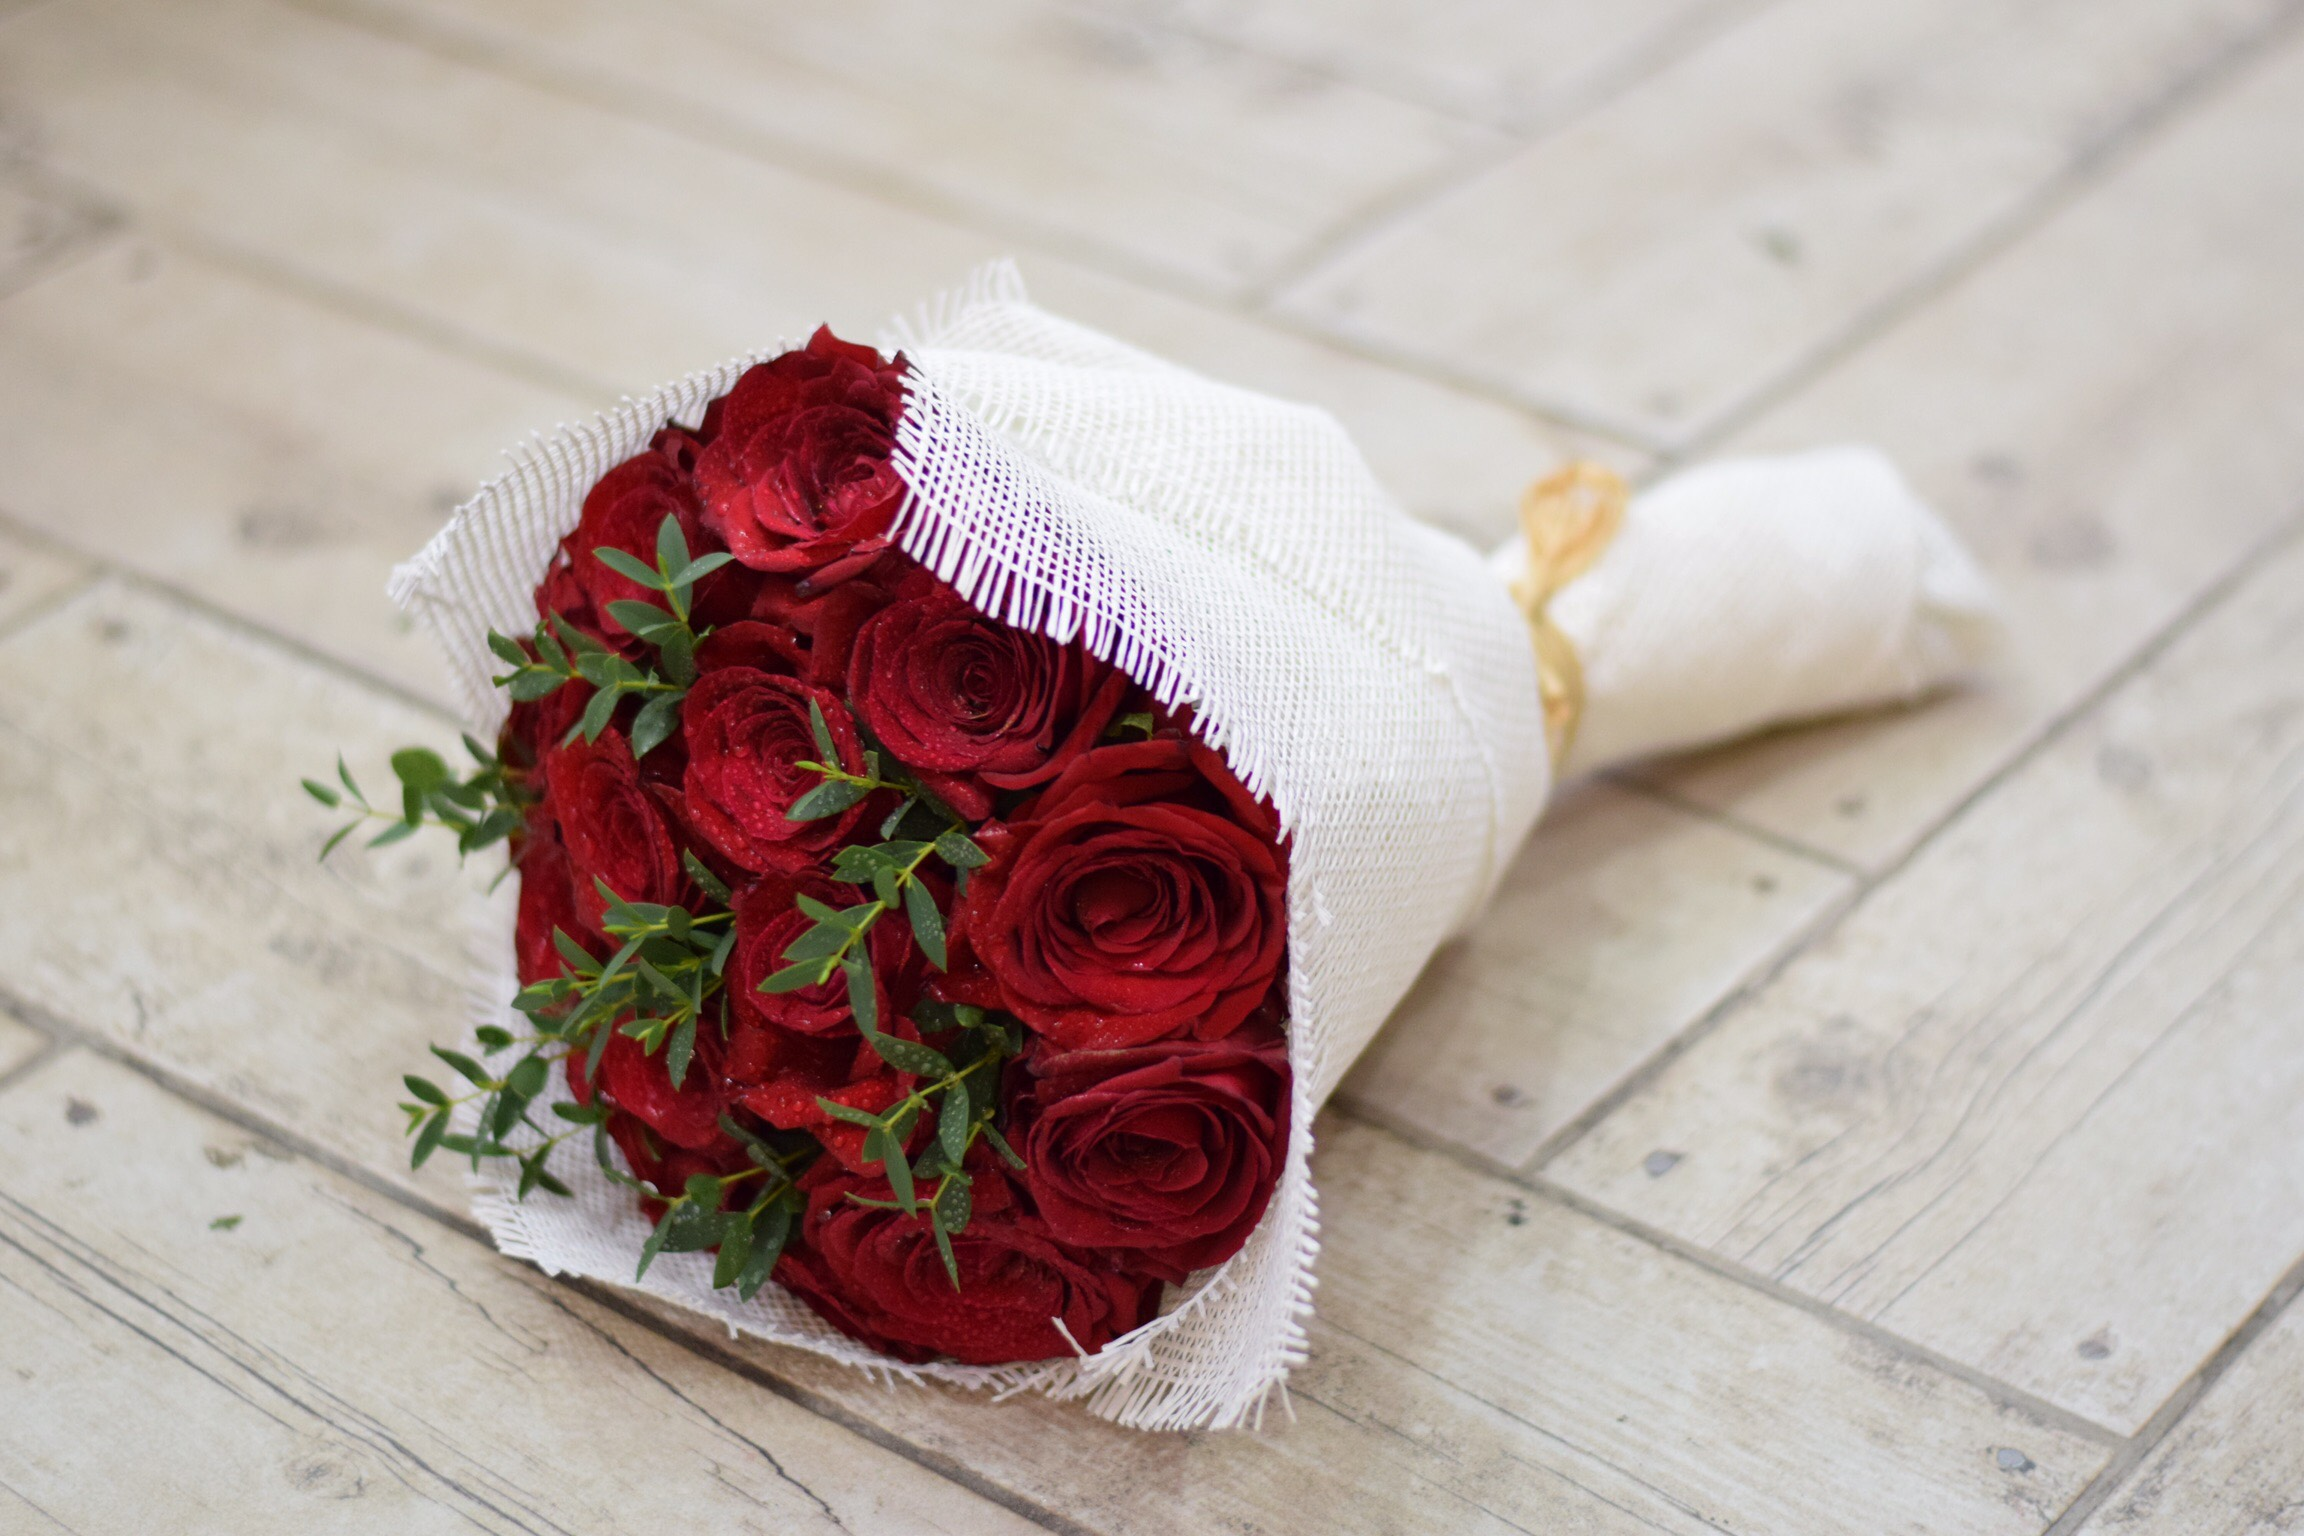 Flower Bouquet - Red 'Bouquets'